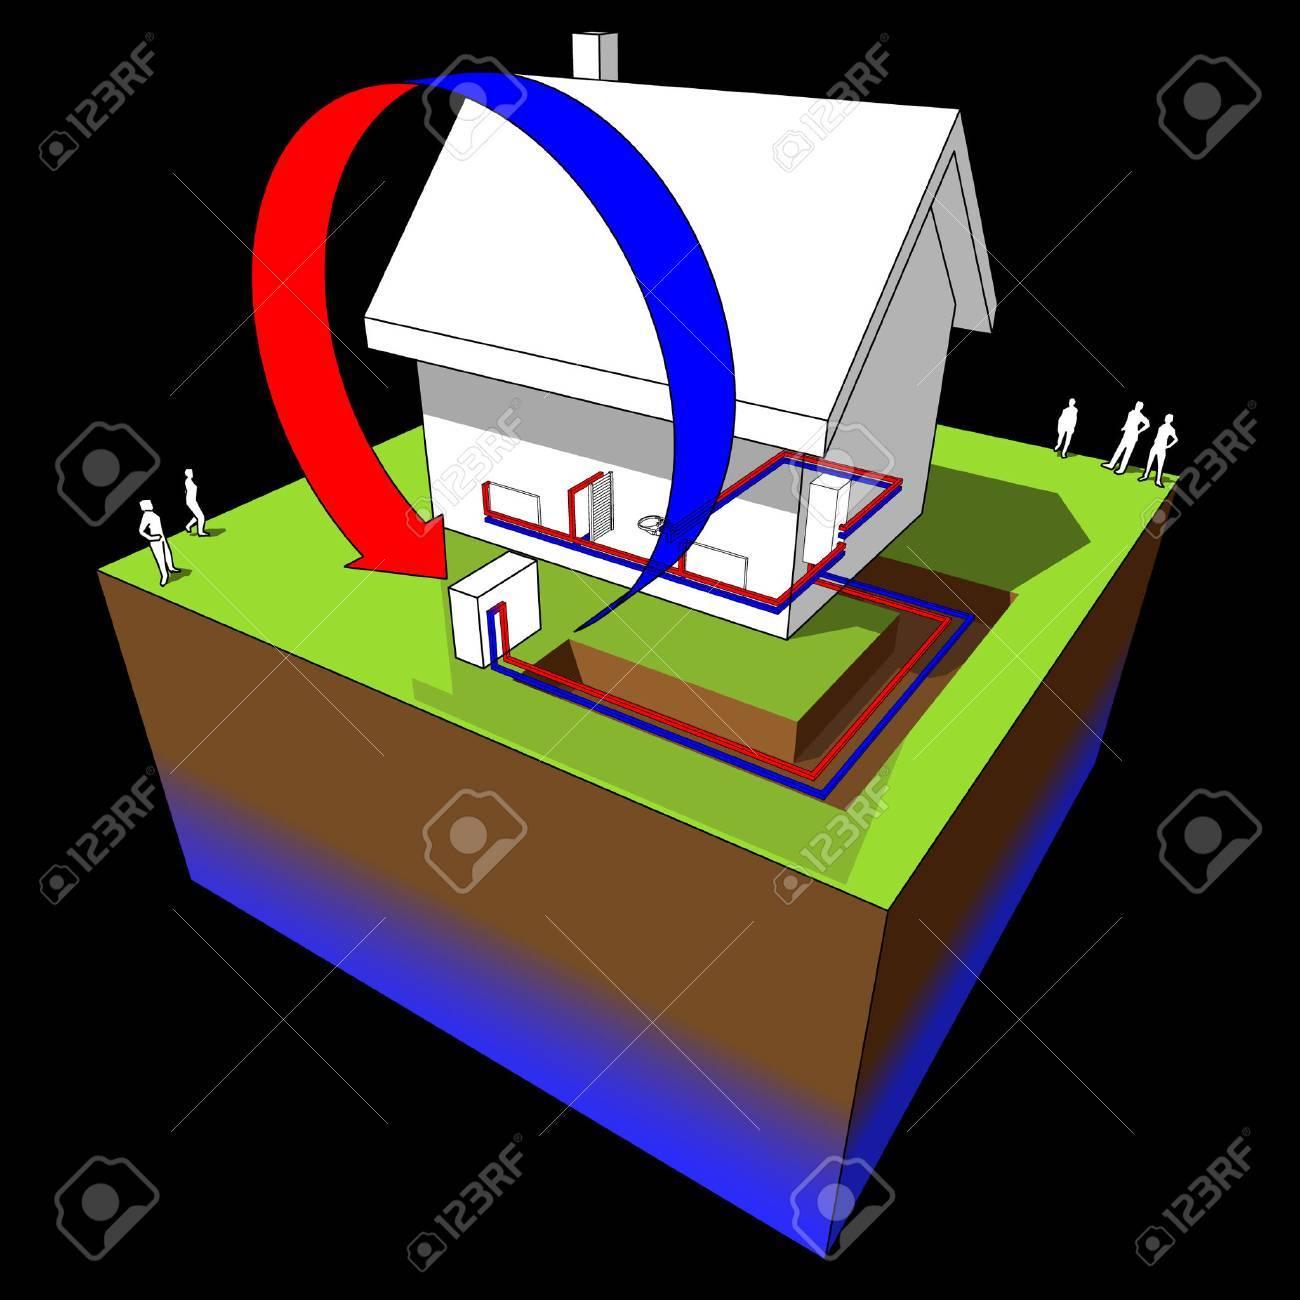 hight resolution of air source heat pump diagram stock vector 9035807